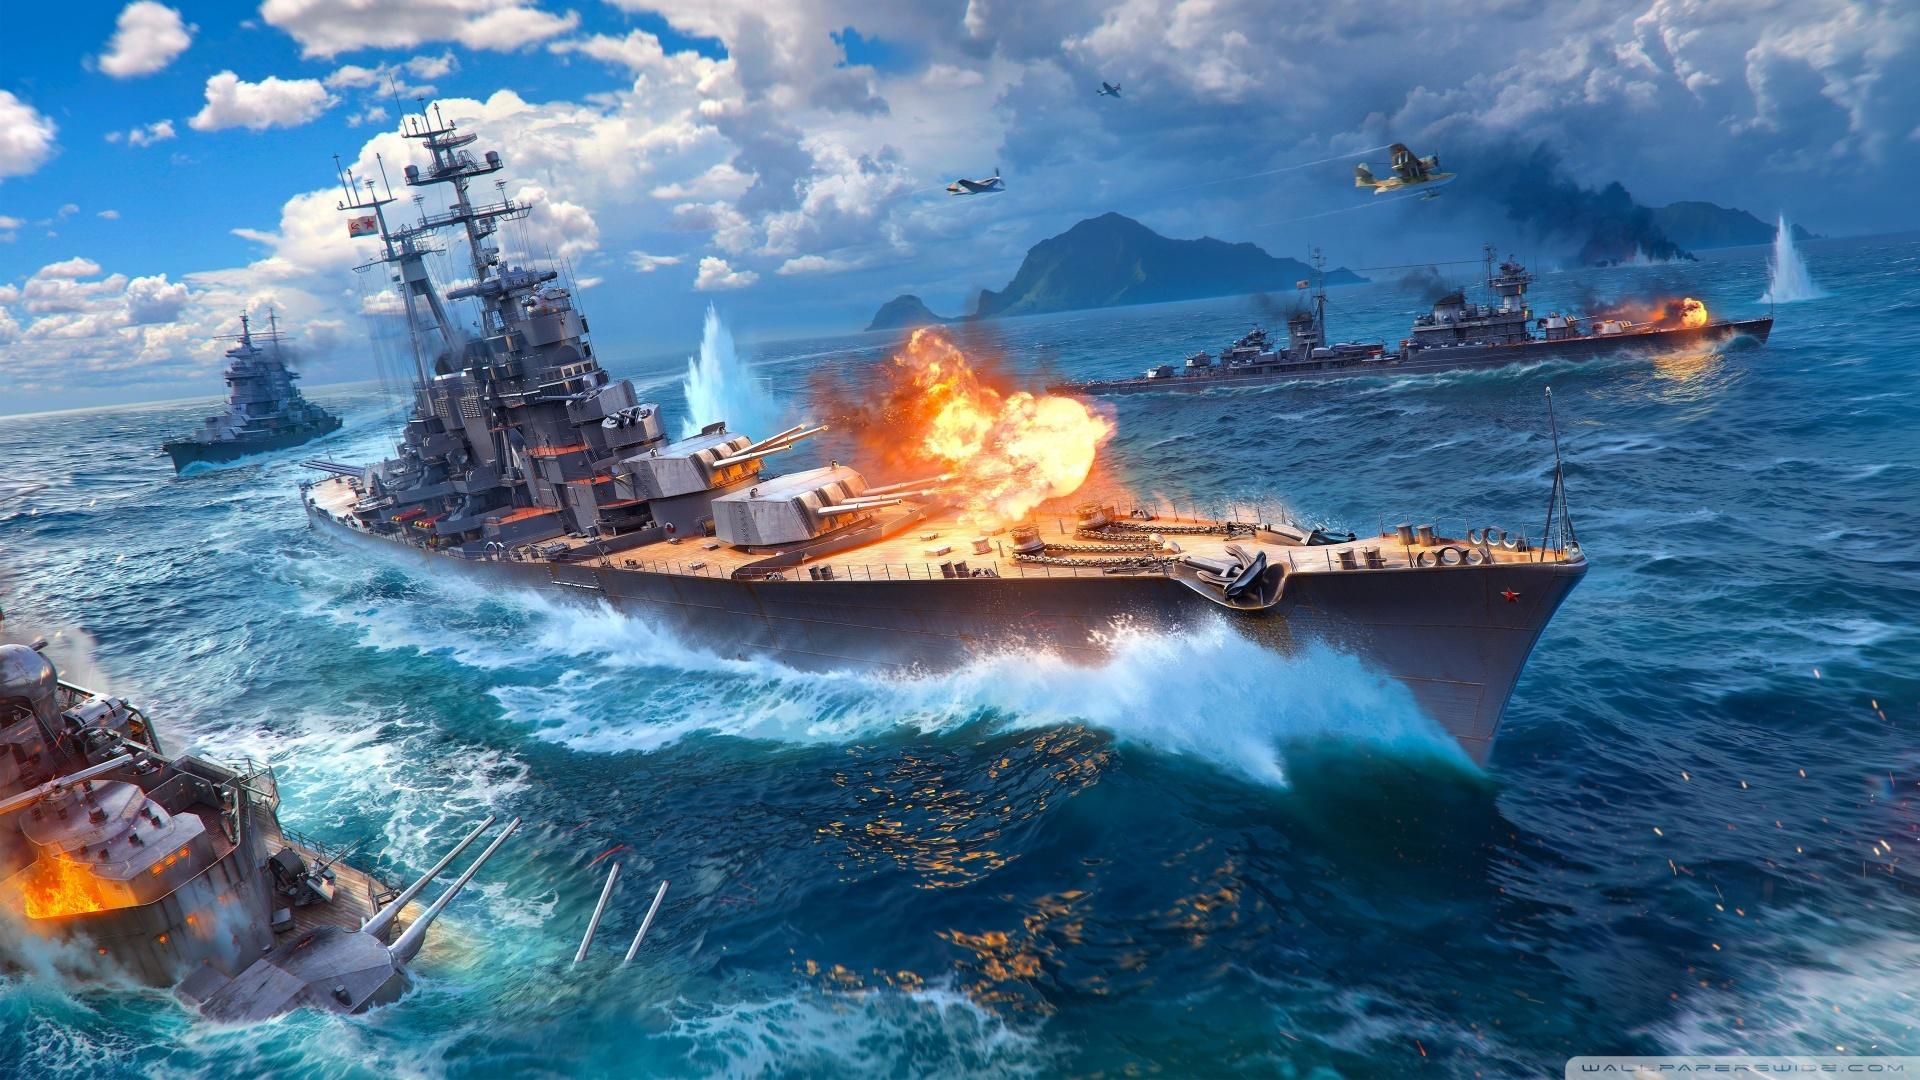 world_of_warships_3-wallpaper-1920x1080